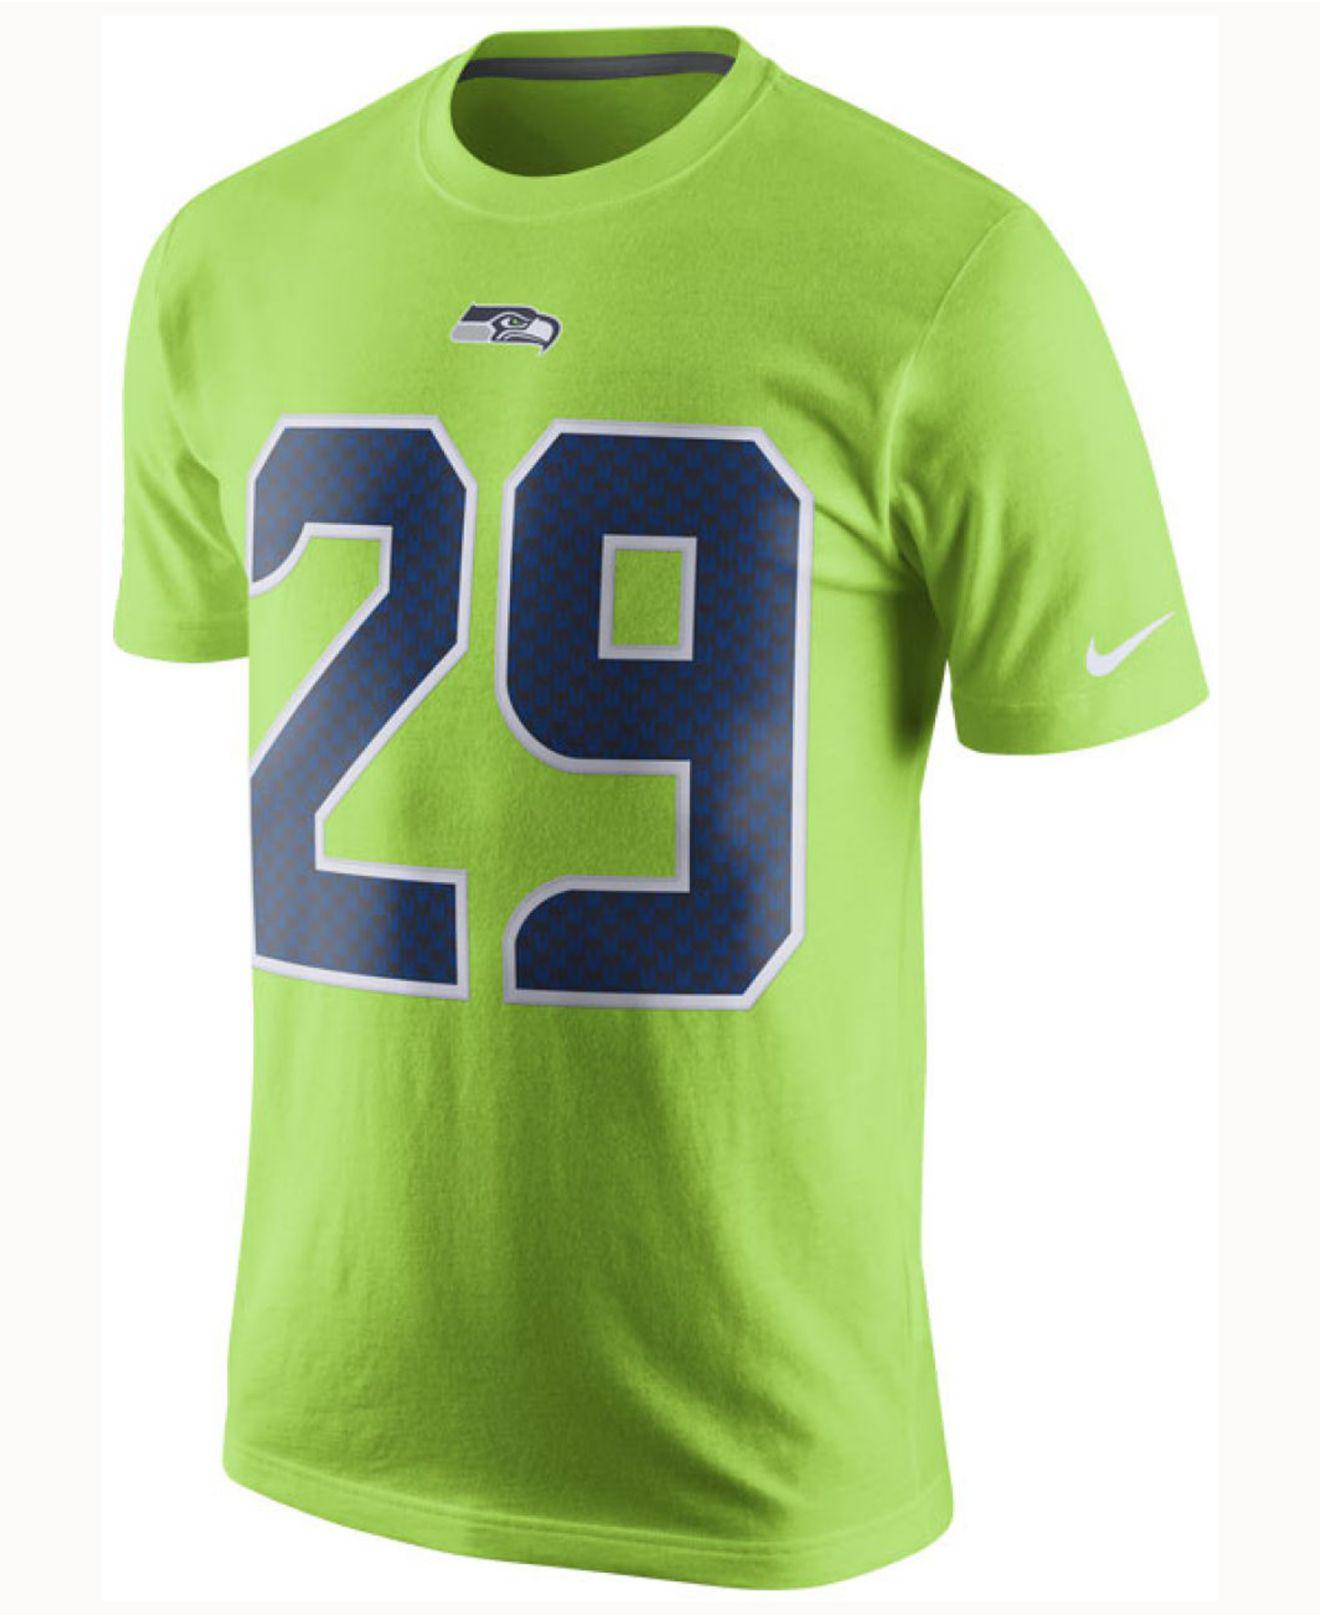 Lyst - Nike Men s Earl Thomas Iii Seattle Seahawks Color Rush Name   Number  T-shirt in Green for Men 3b95ec4b3